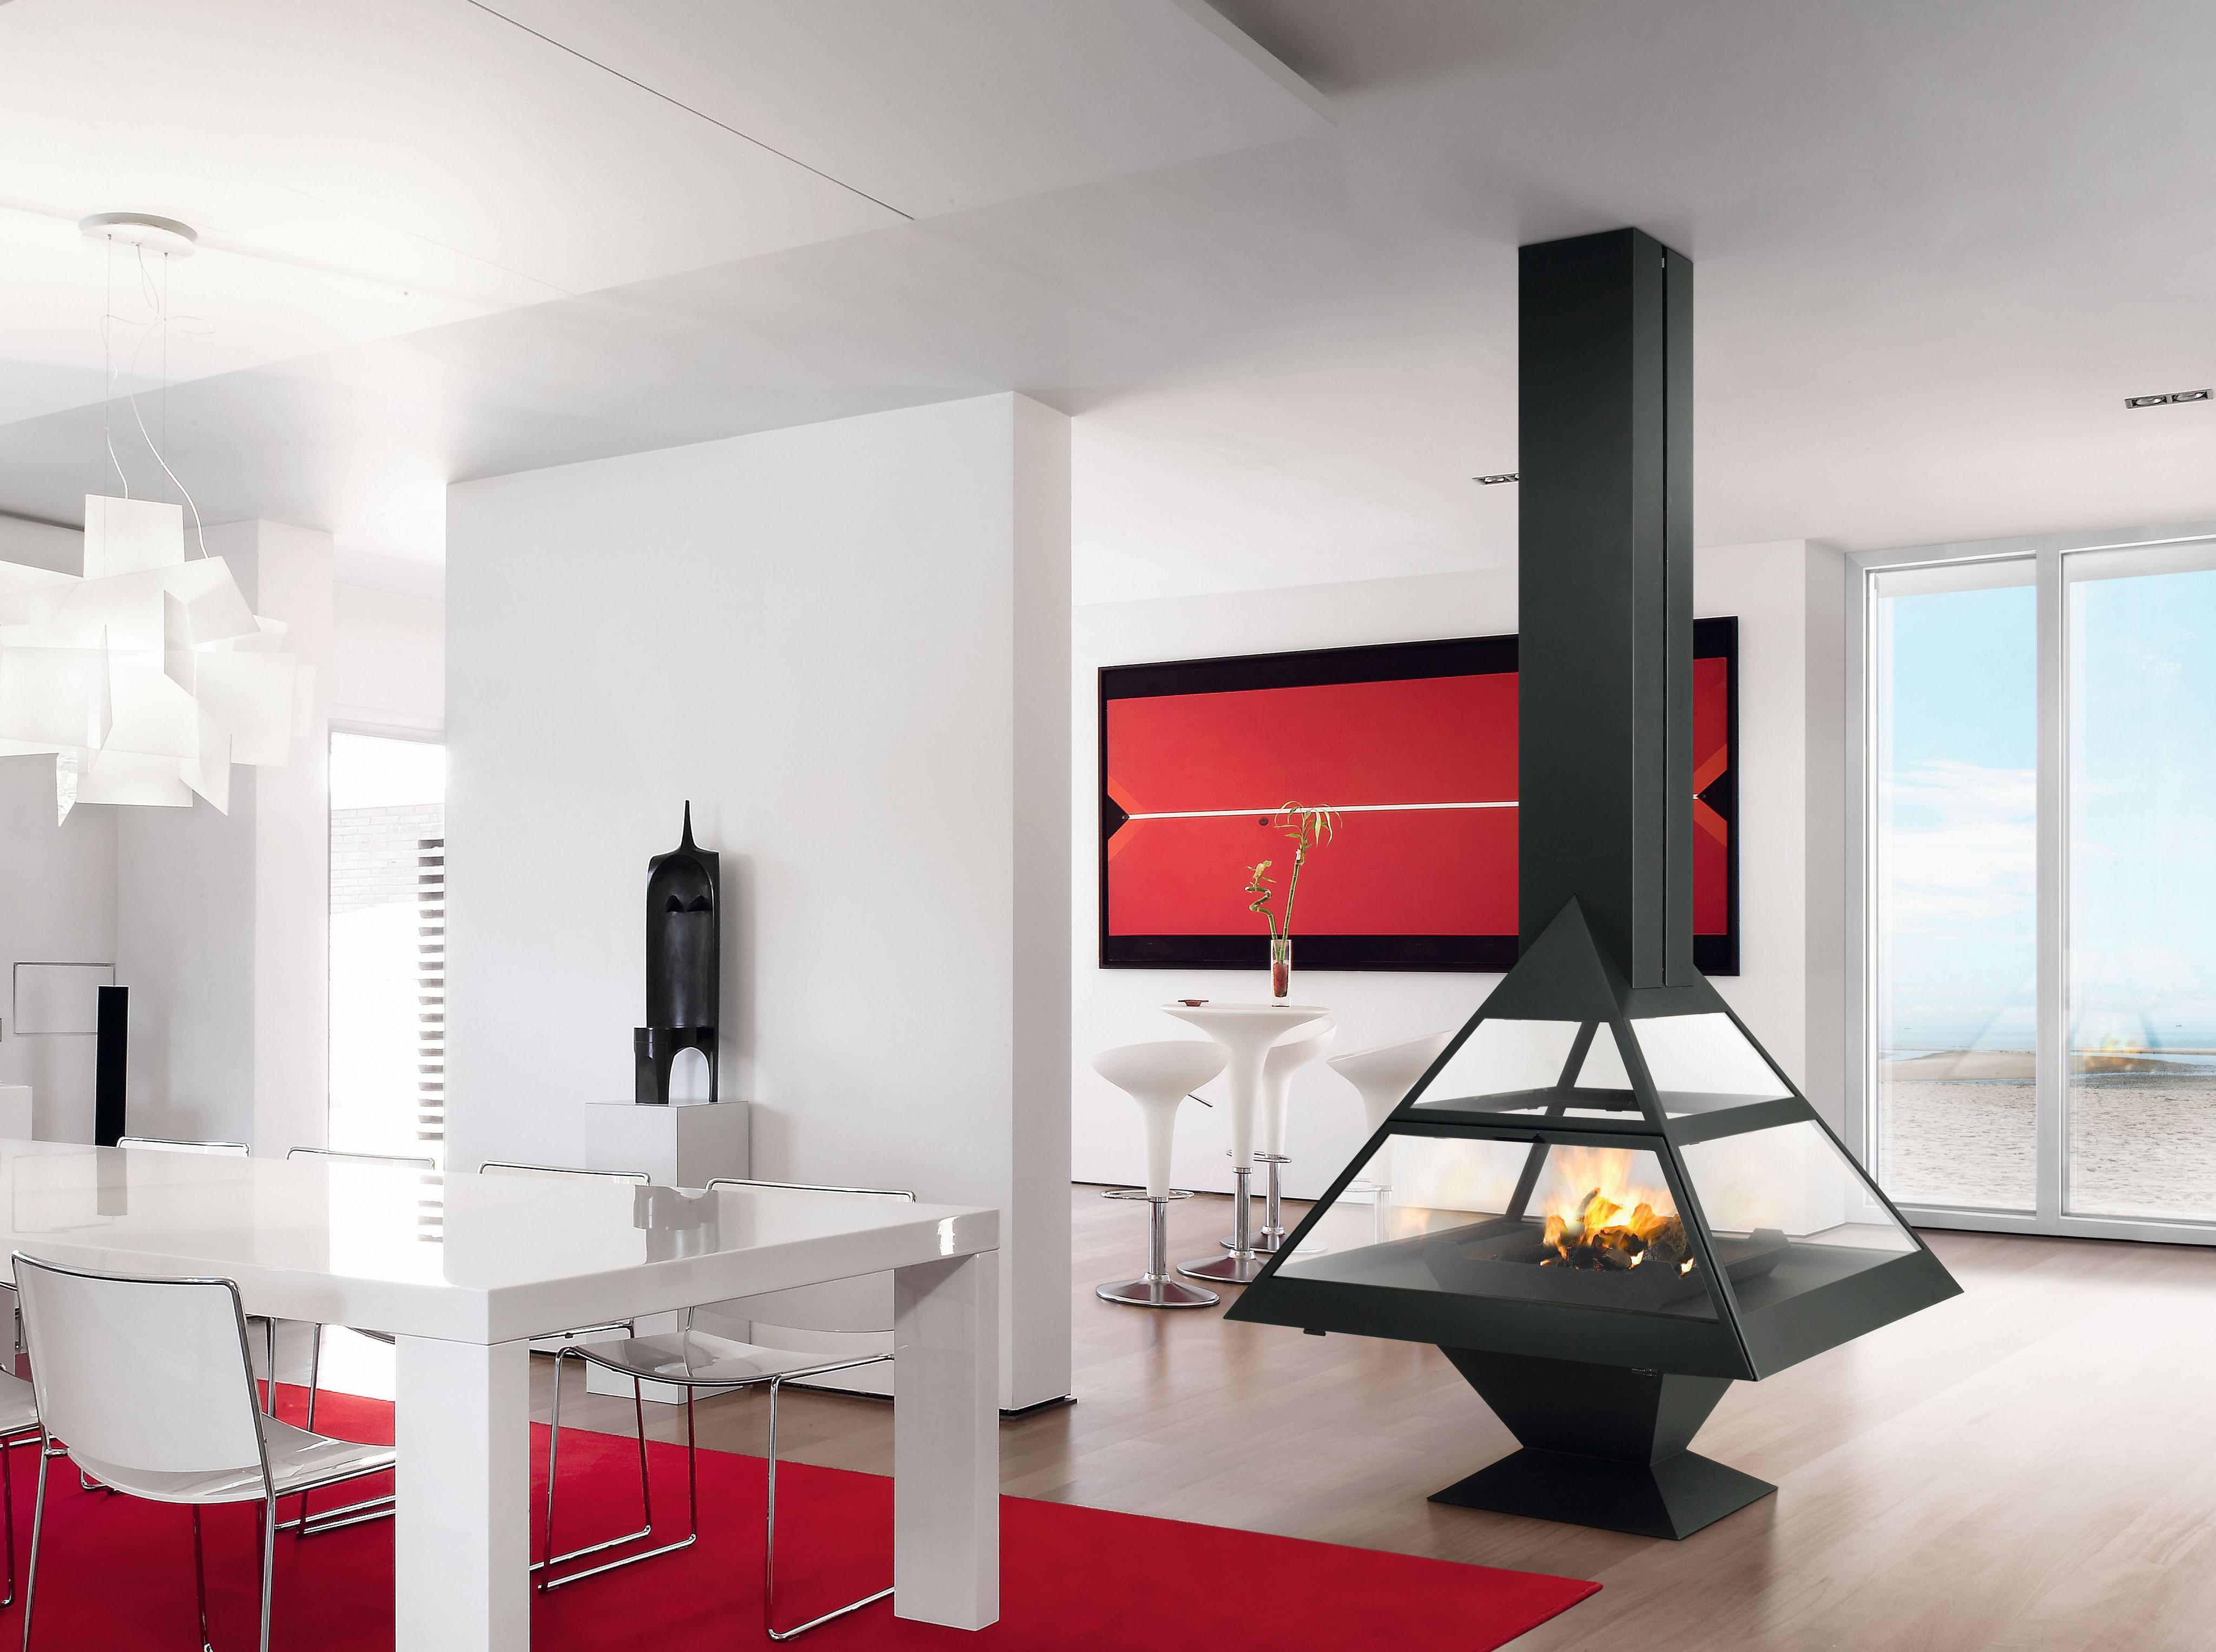 po les granul s design chemin es suspendues centrales. Black Bedroom Furniture Sets. Home Design Ideas